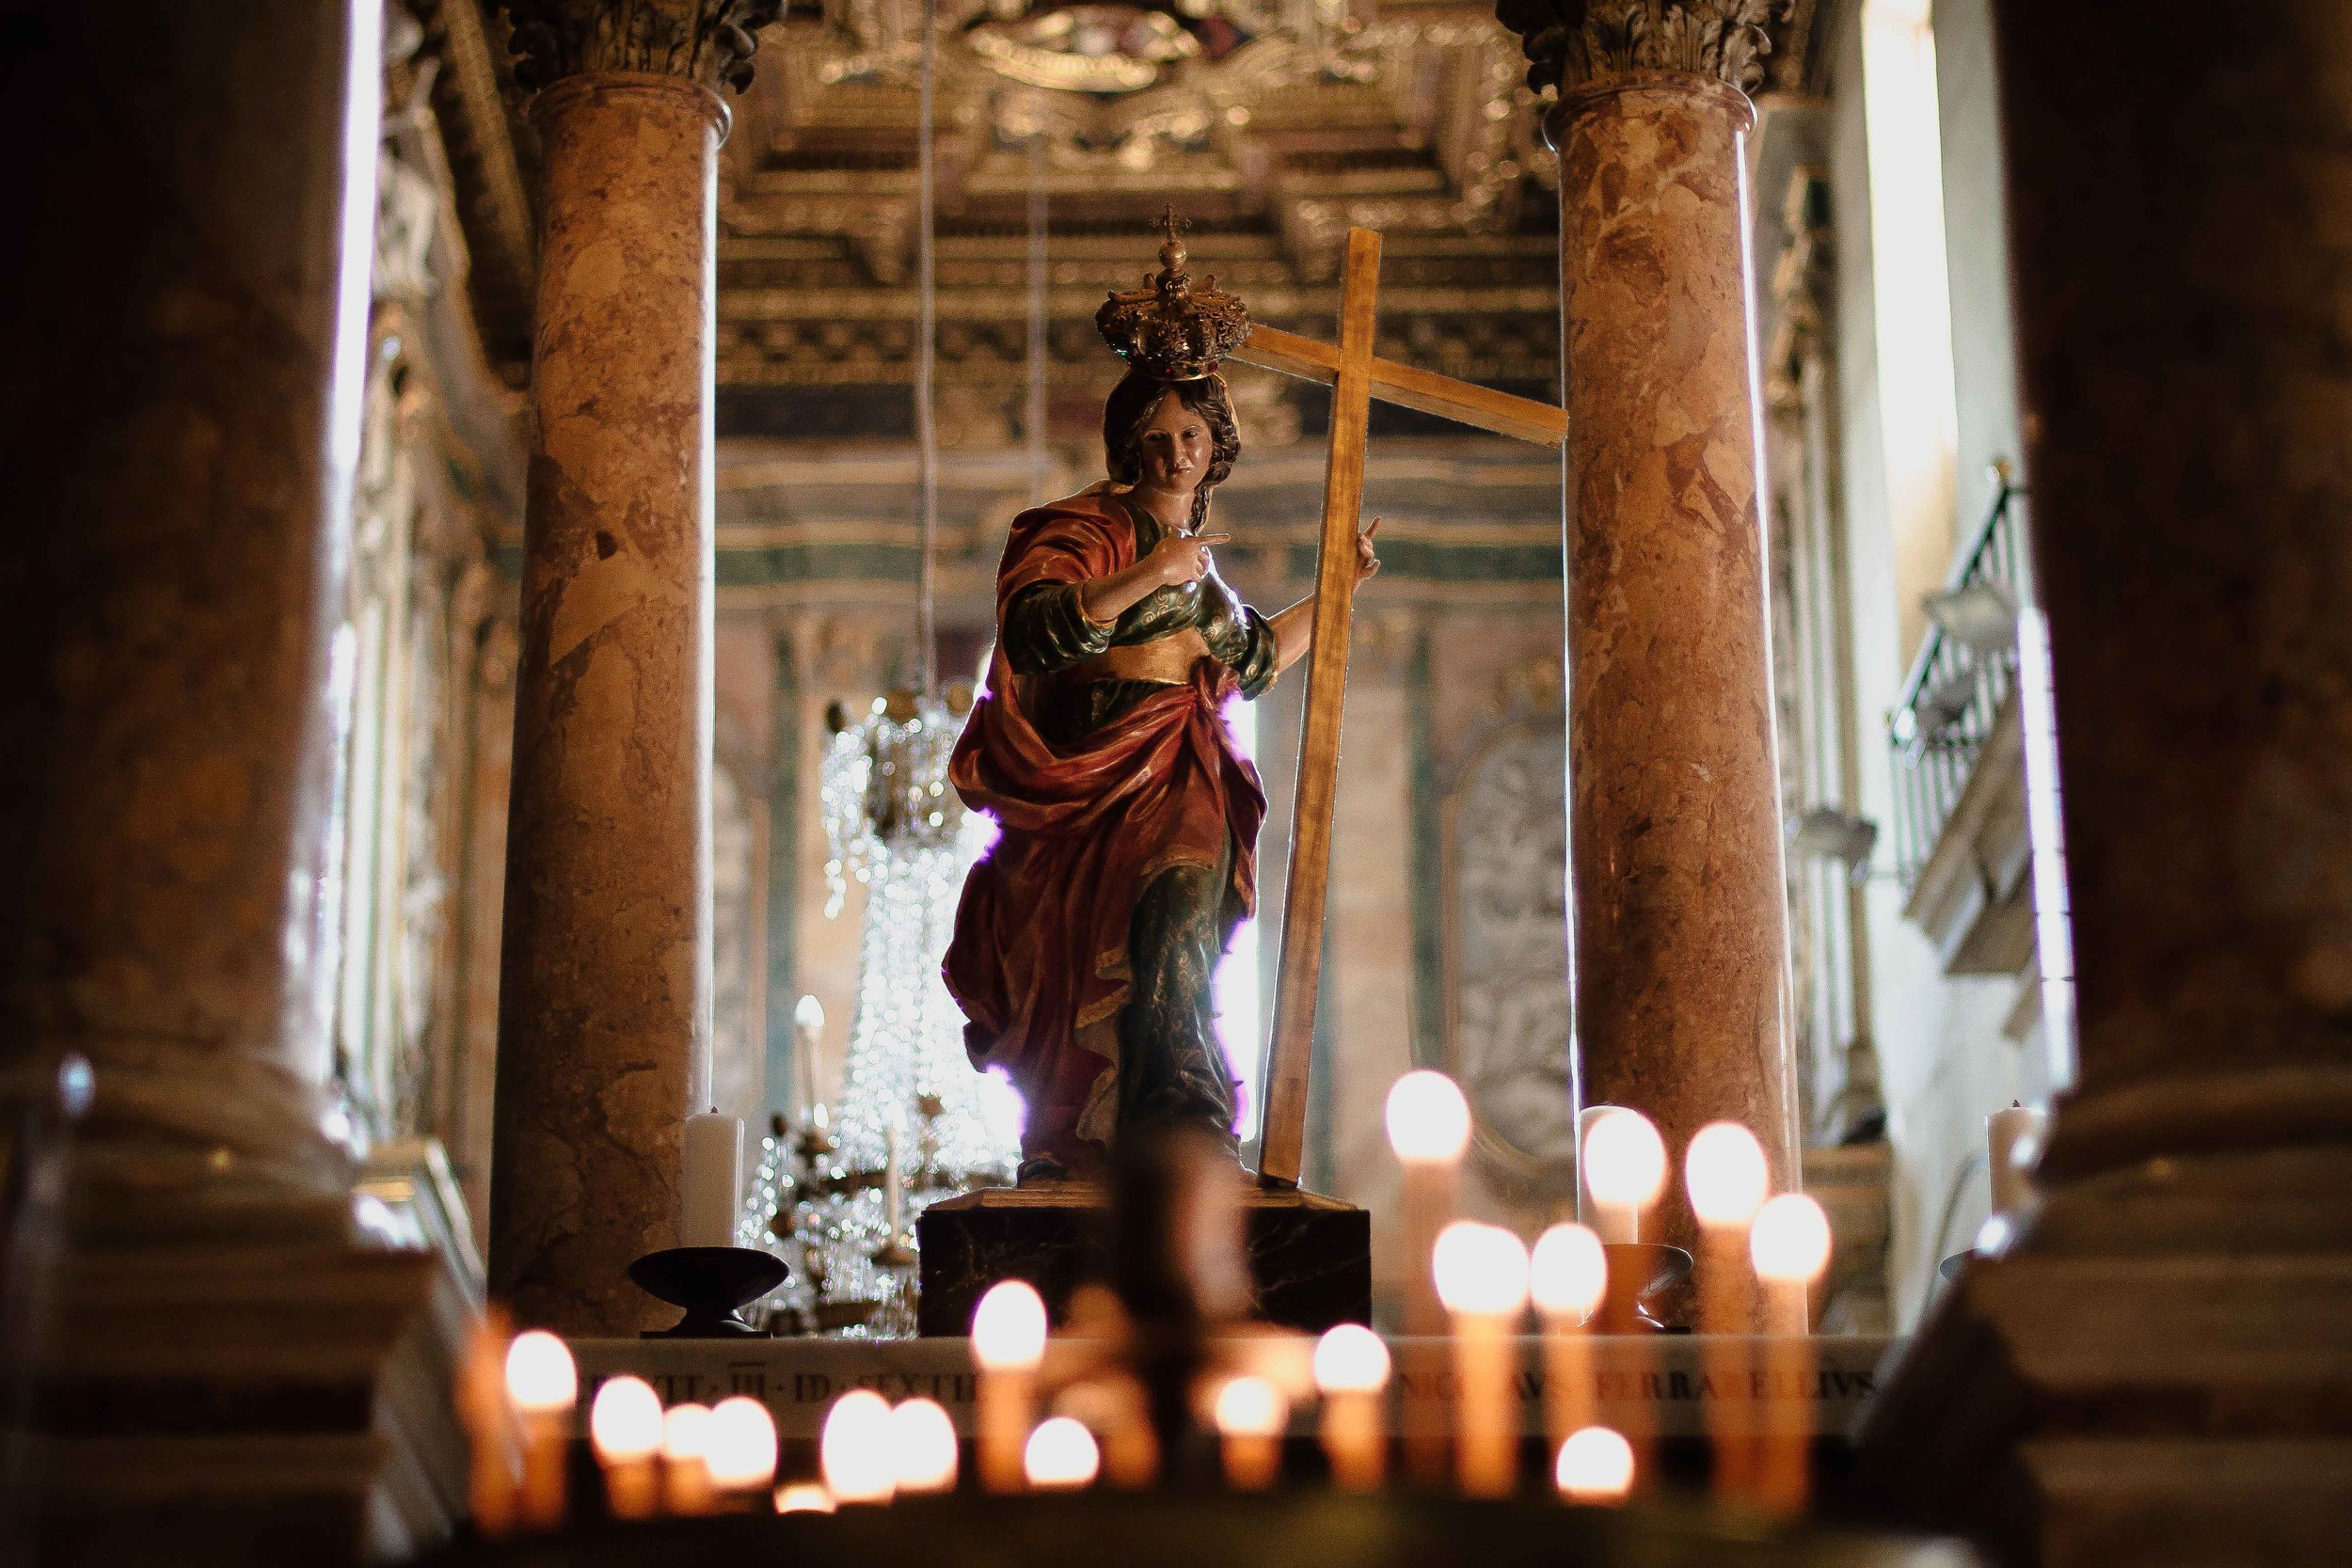 Emily Wilson Photography portrait photographer Rome Italy (12).jpg